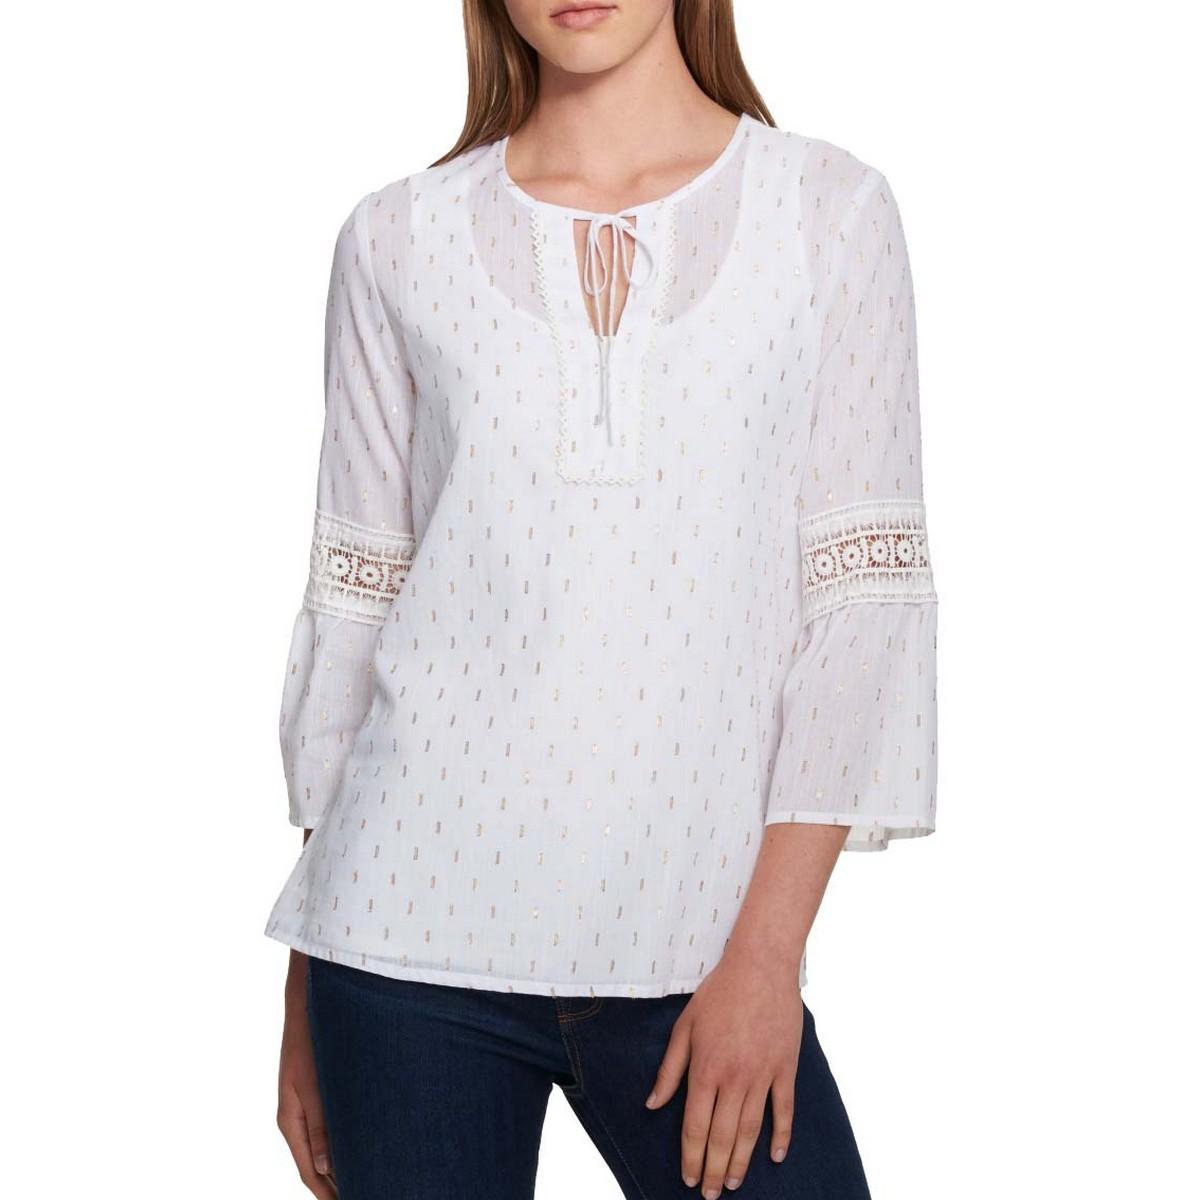 Details about TOMMY HILFIGER NEW Women's White Cotton Blend Denim Jacket Top XS TEDO